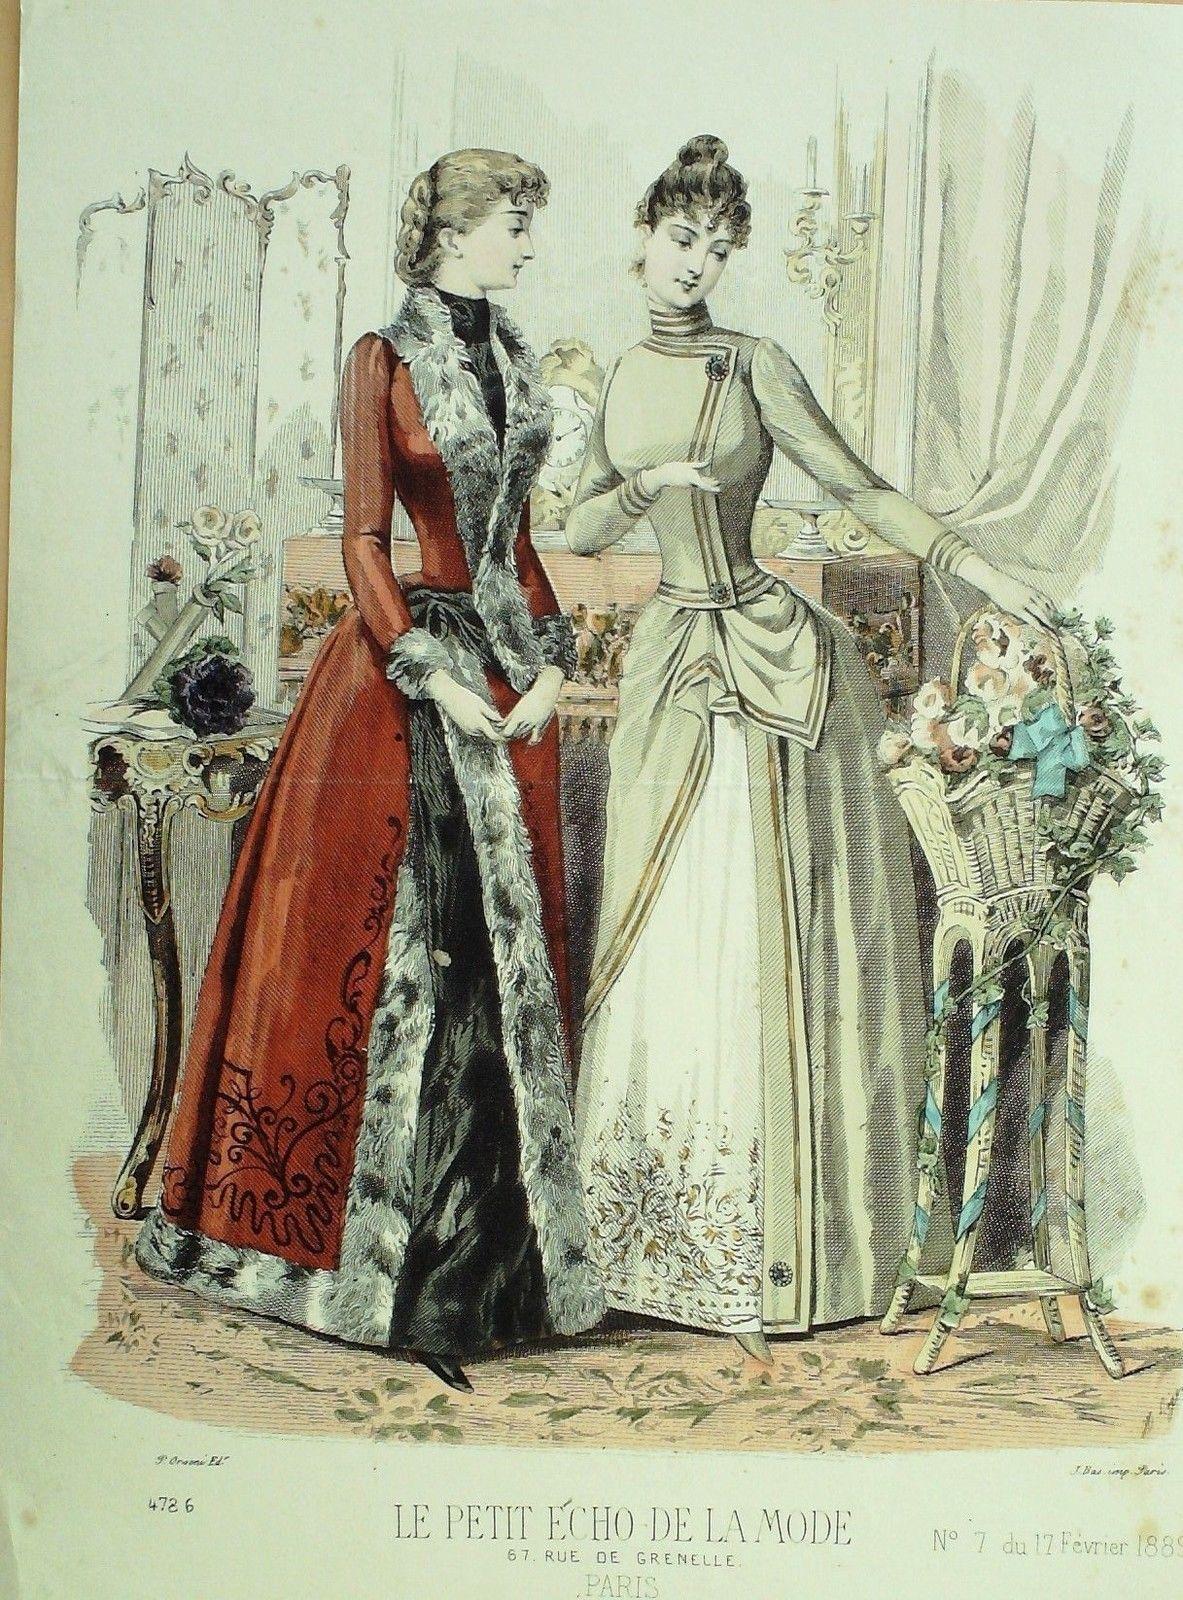 1889 (Feb. 17) Le Petit Echo de la Mode